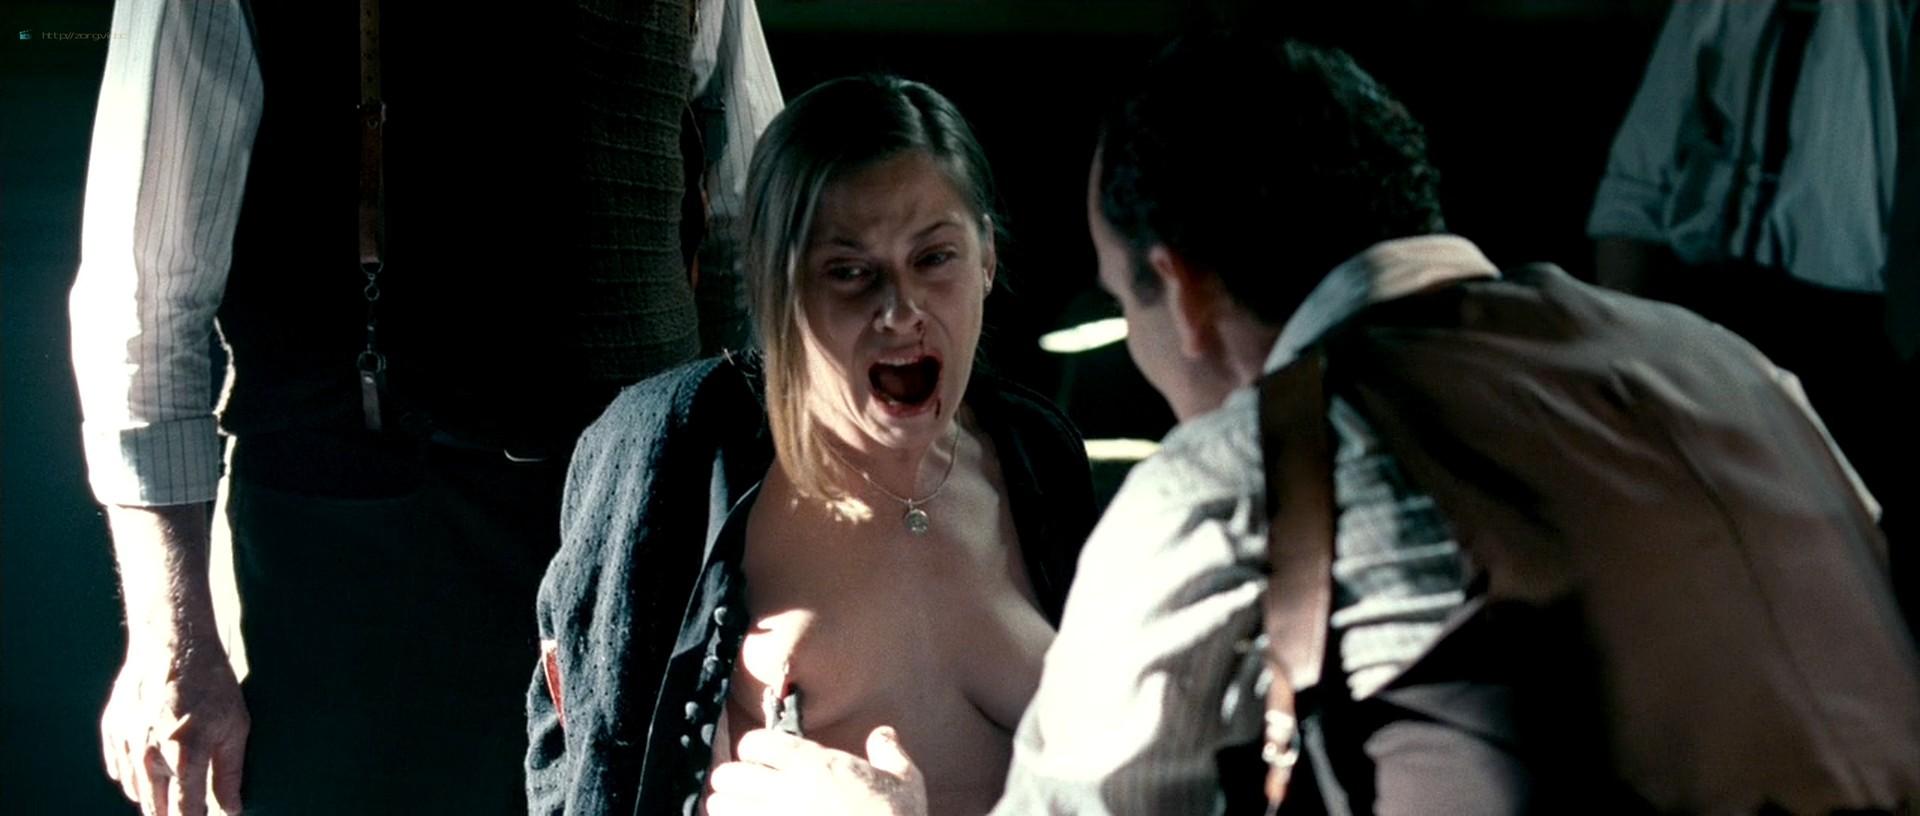 Maria Leon nude in - La voz dormida (2011) HD 1080p BluRay (7)